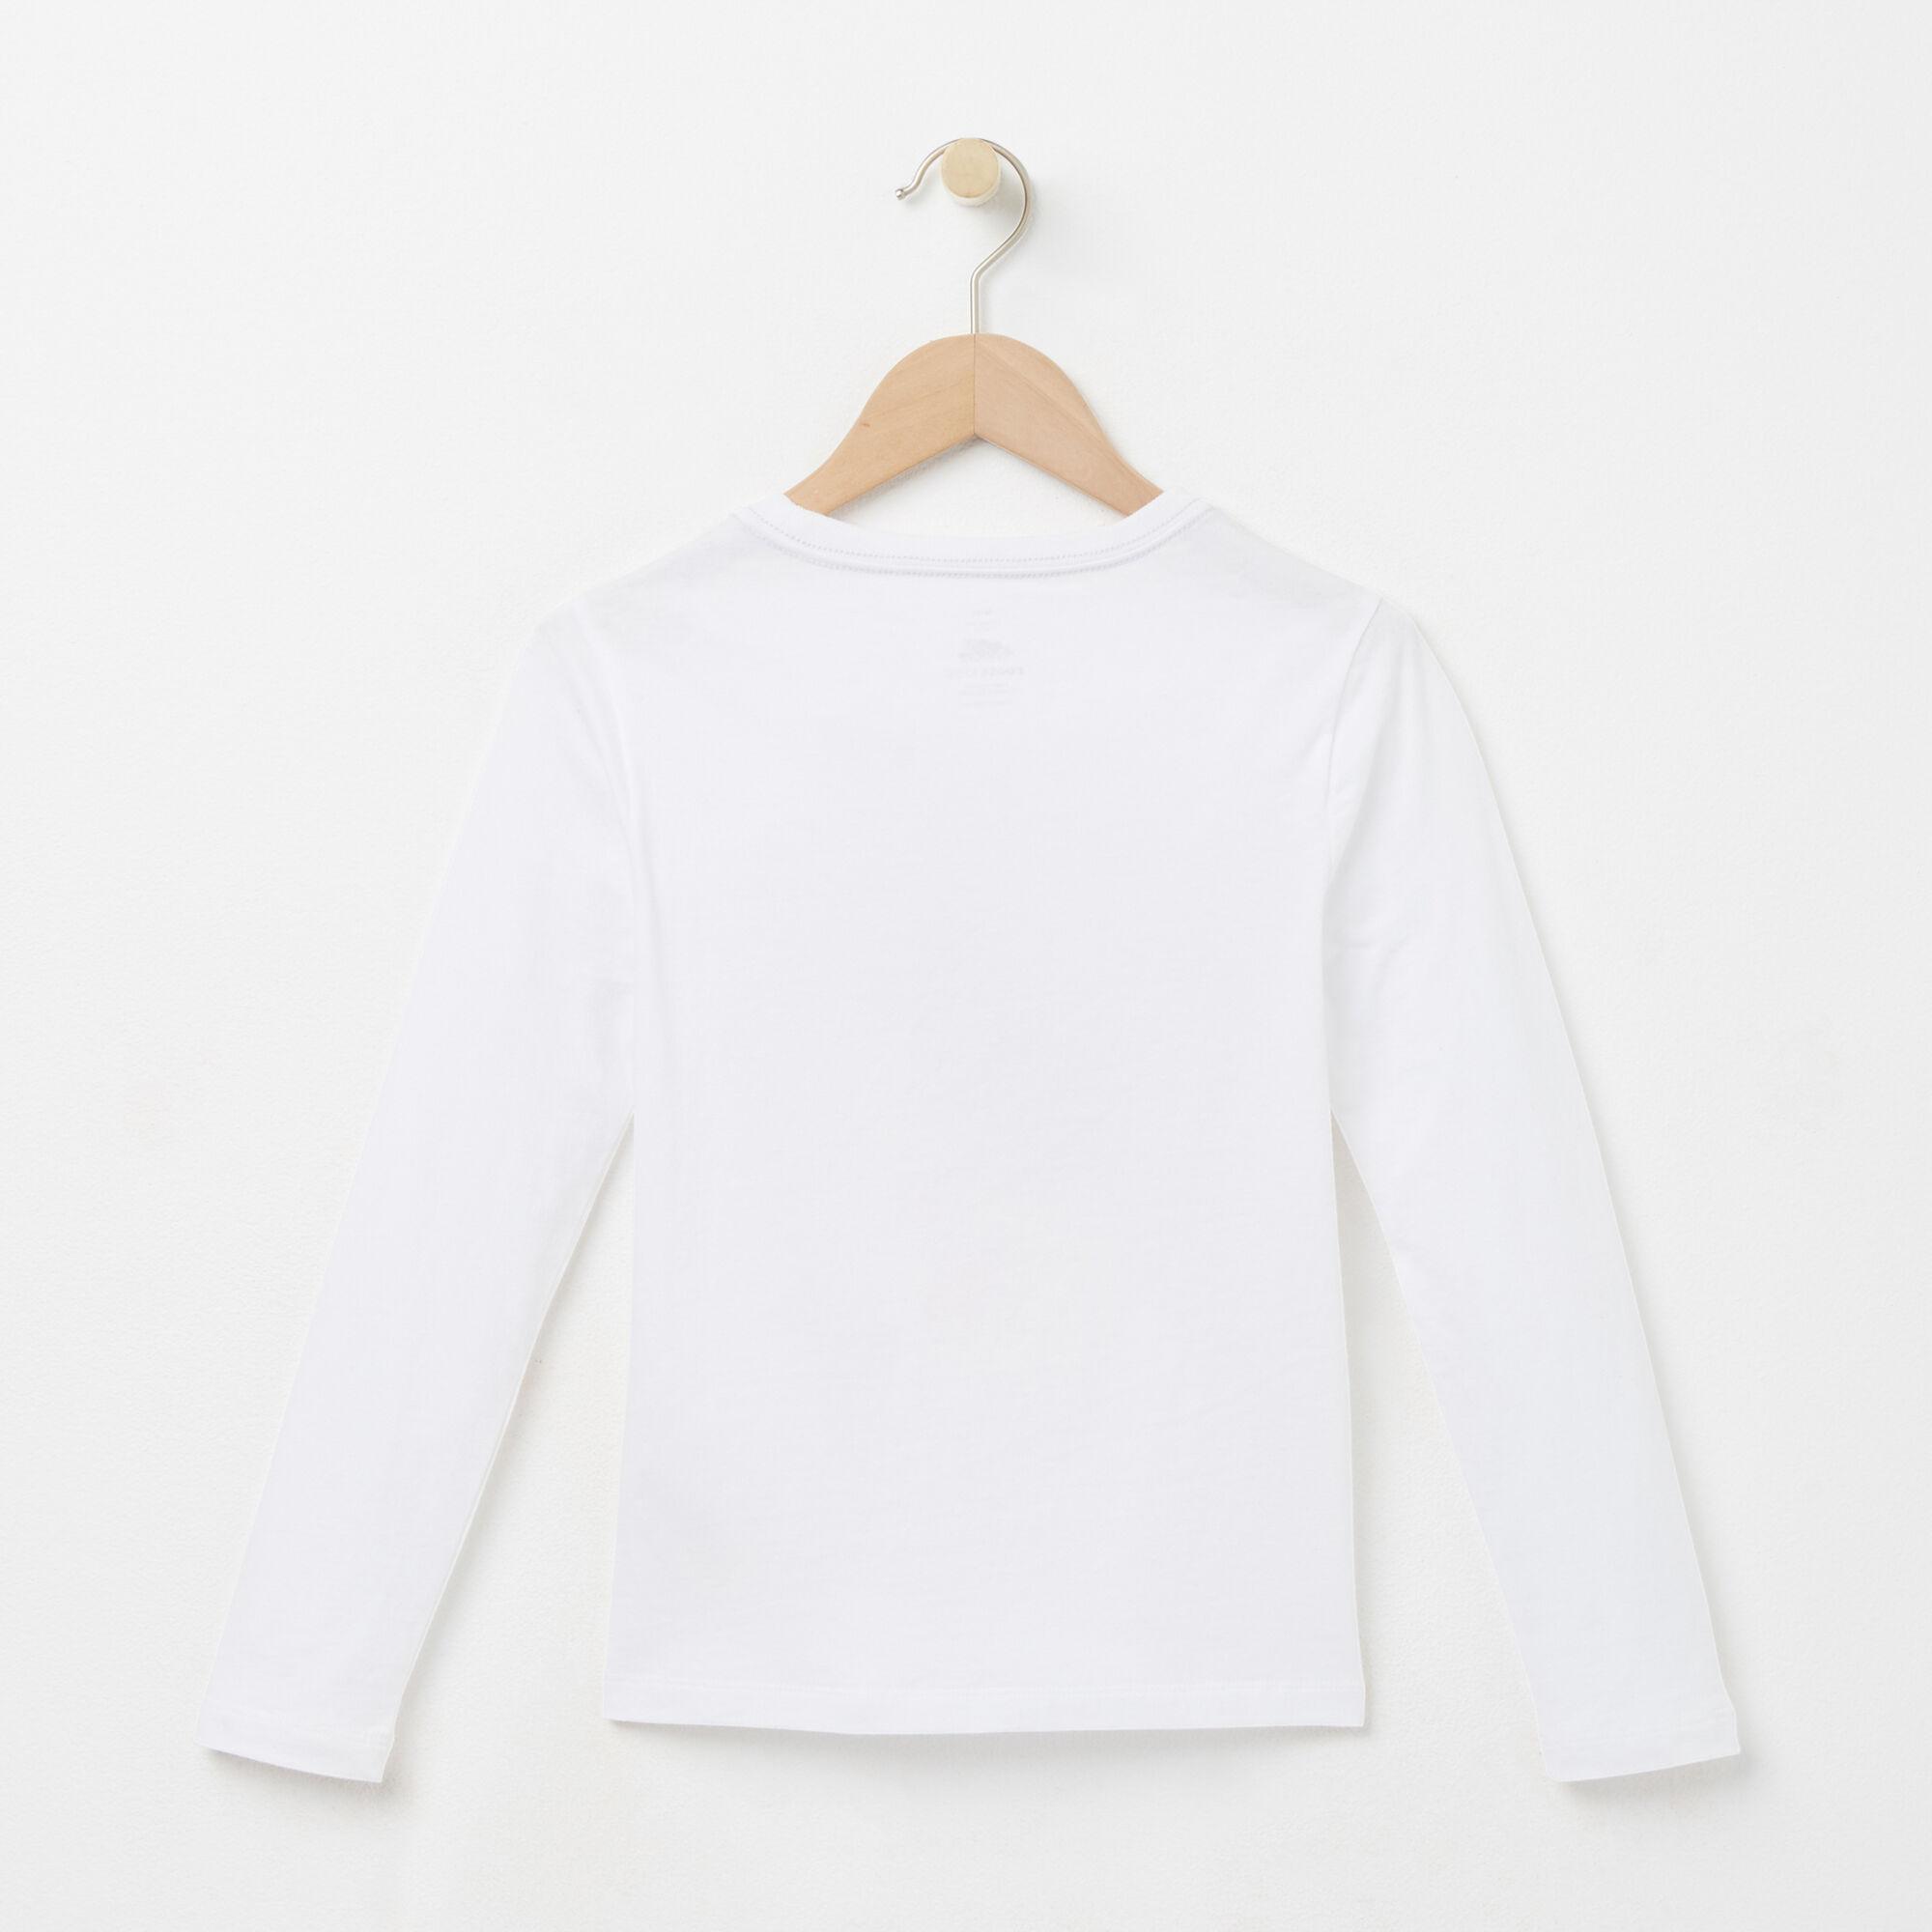 Filles T-shirt Imprimé Roots